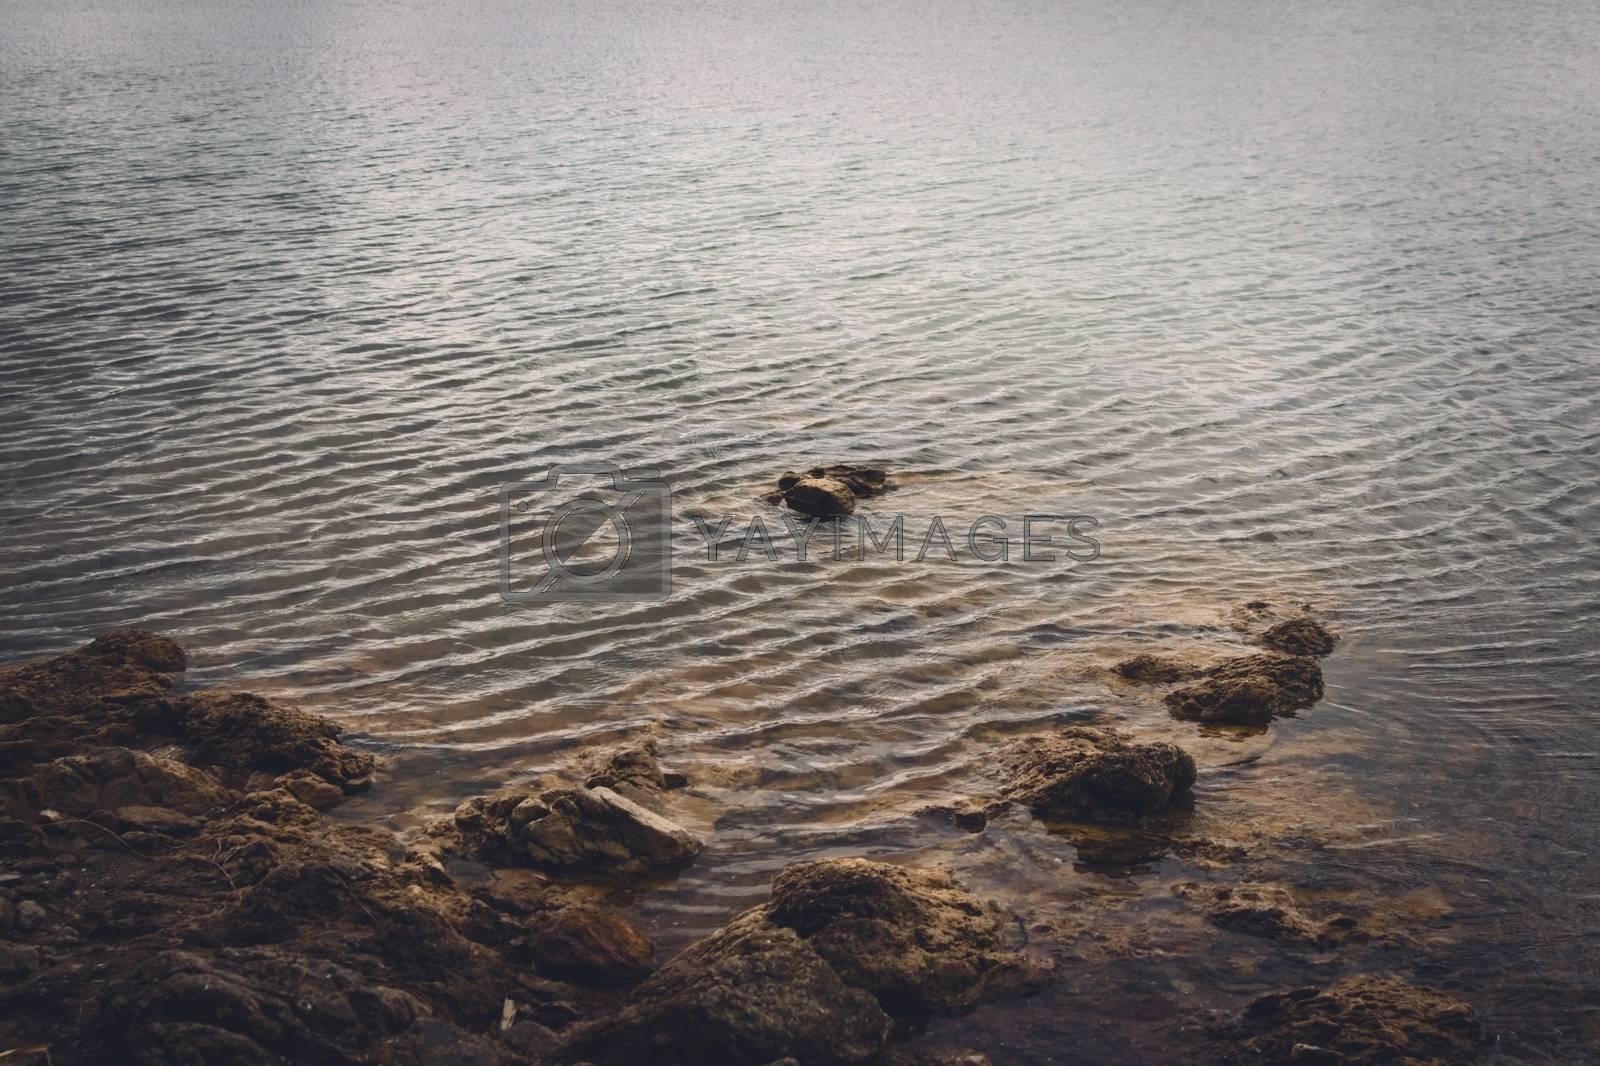 Royalty free image of Rocky shore of lake La Florida, in San Luis, Argentina by hernan_hyper